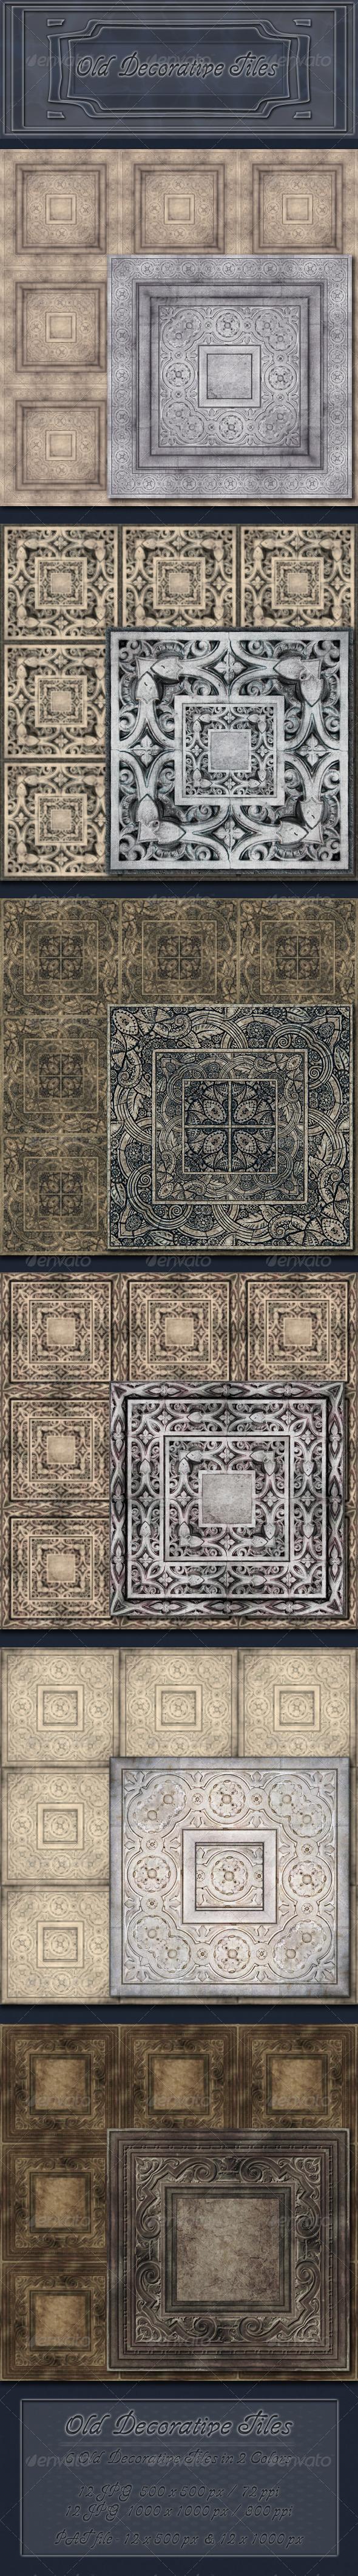 Old Decorative Tiles - Miscellaneous Textures / Fills / Patterns